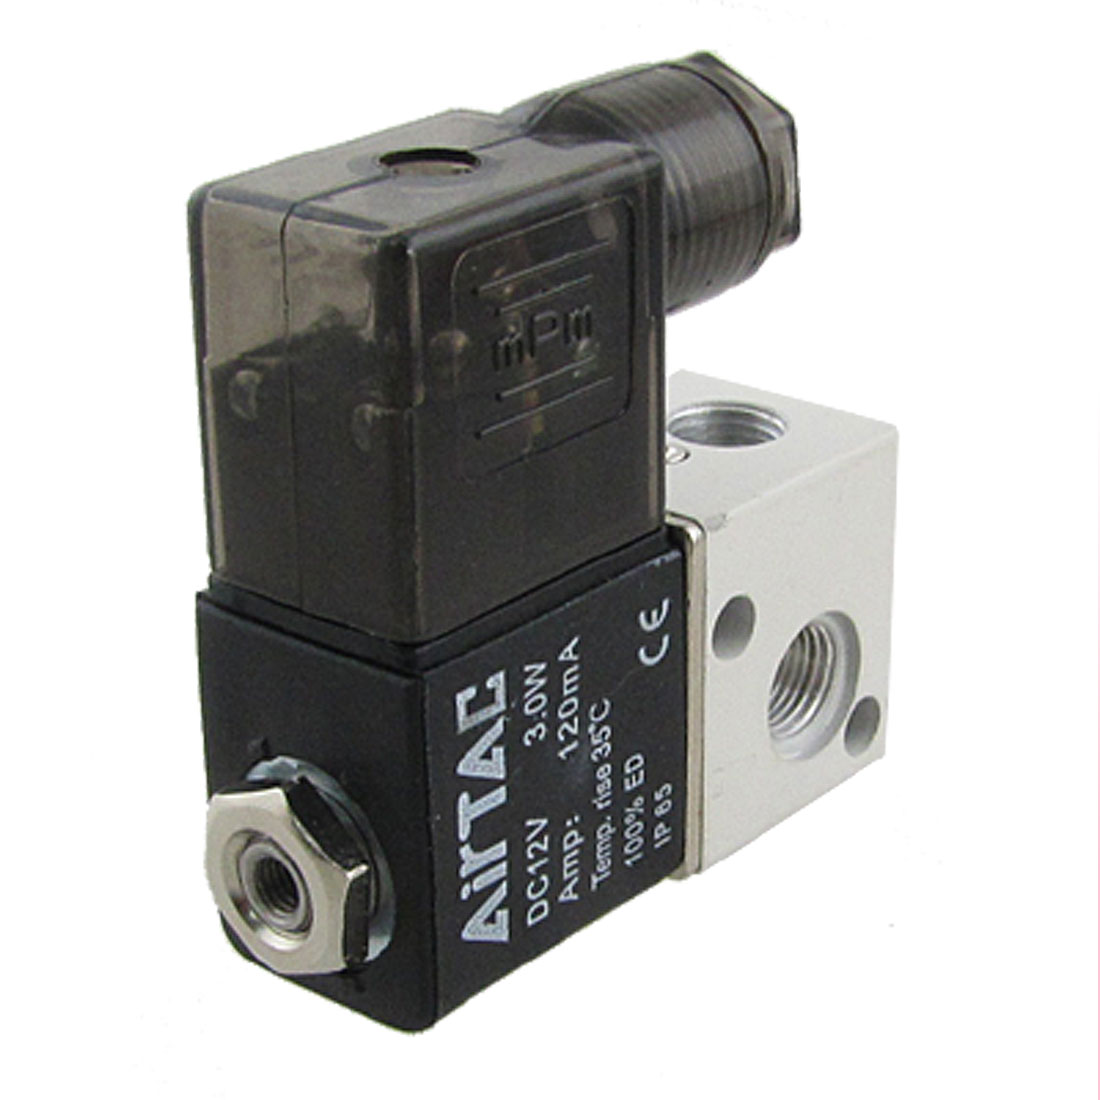 3V1-06 2 Position 3 Way 120mA Pneumatic Solenoid Valve Black